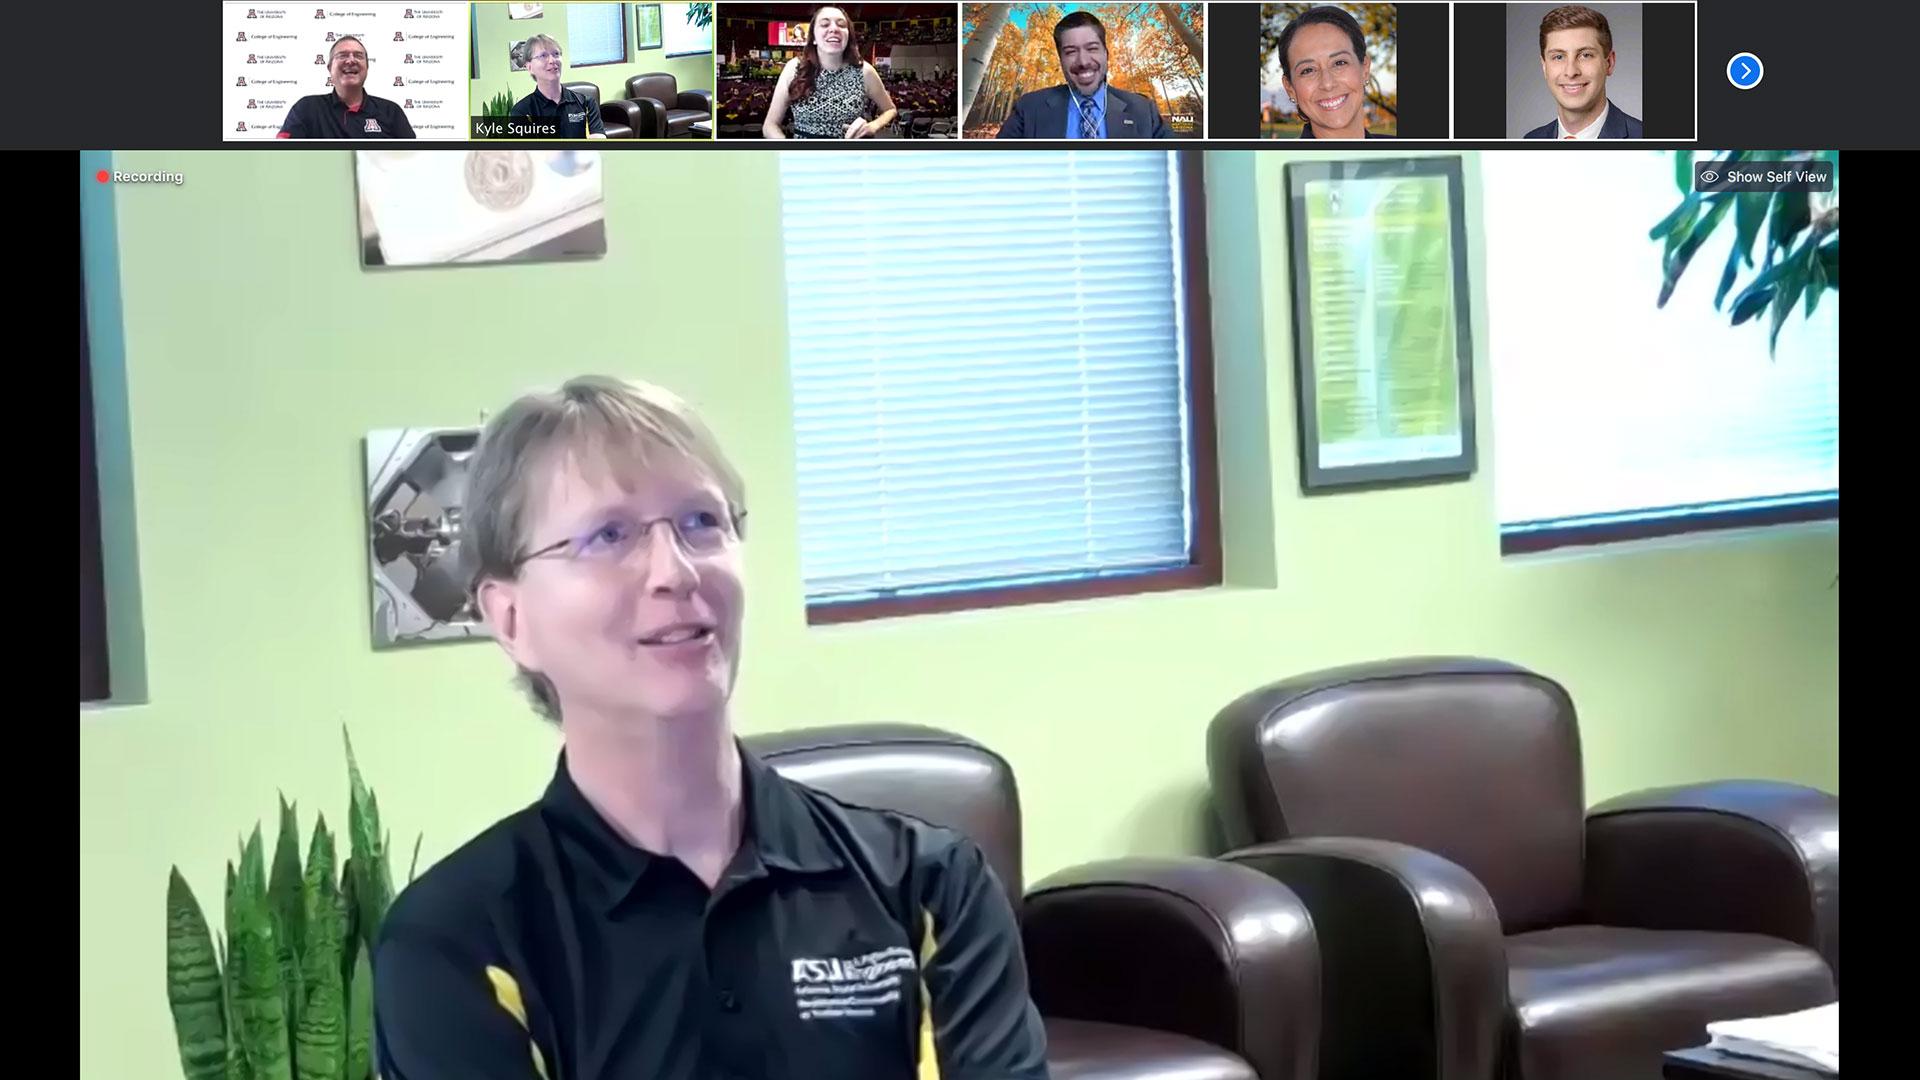 Arizona State University's Kyle Squires speaks during The Challenge online panel of Arizona university deans.